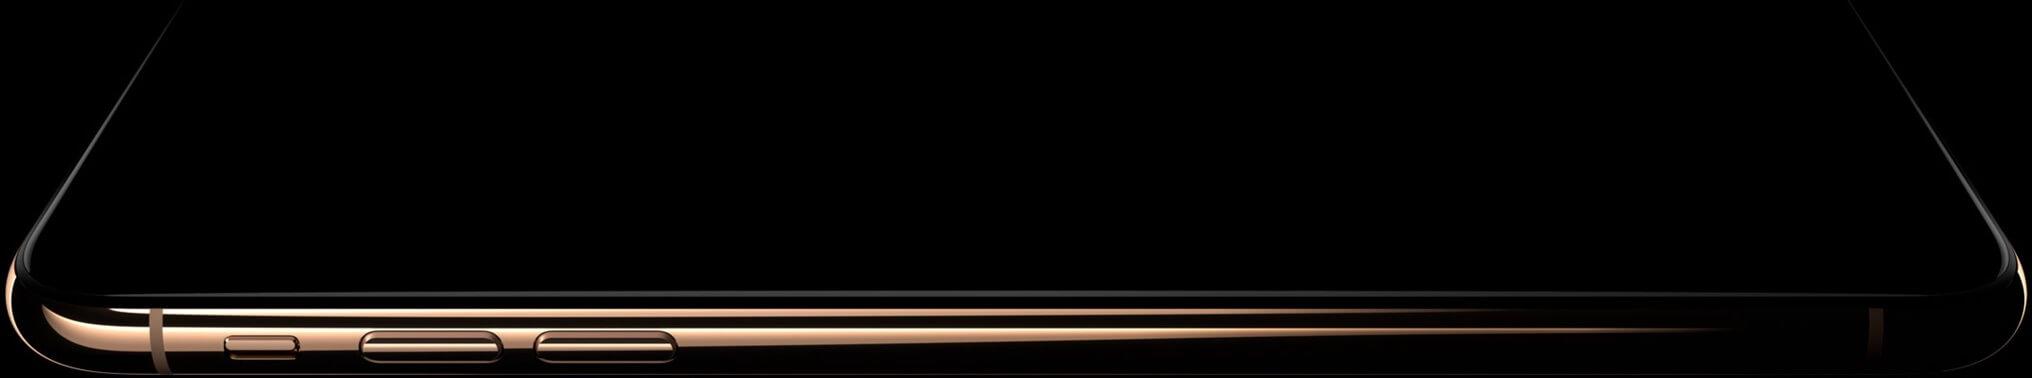 iPhone X Gold Dark